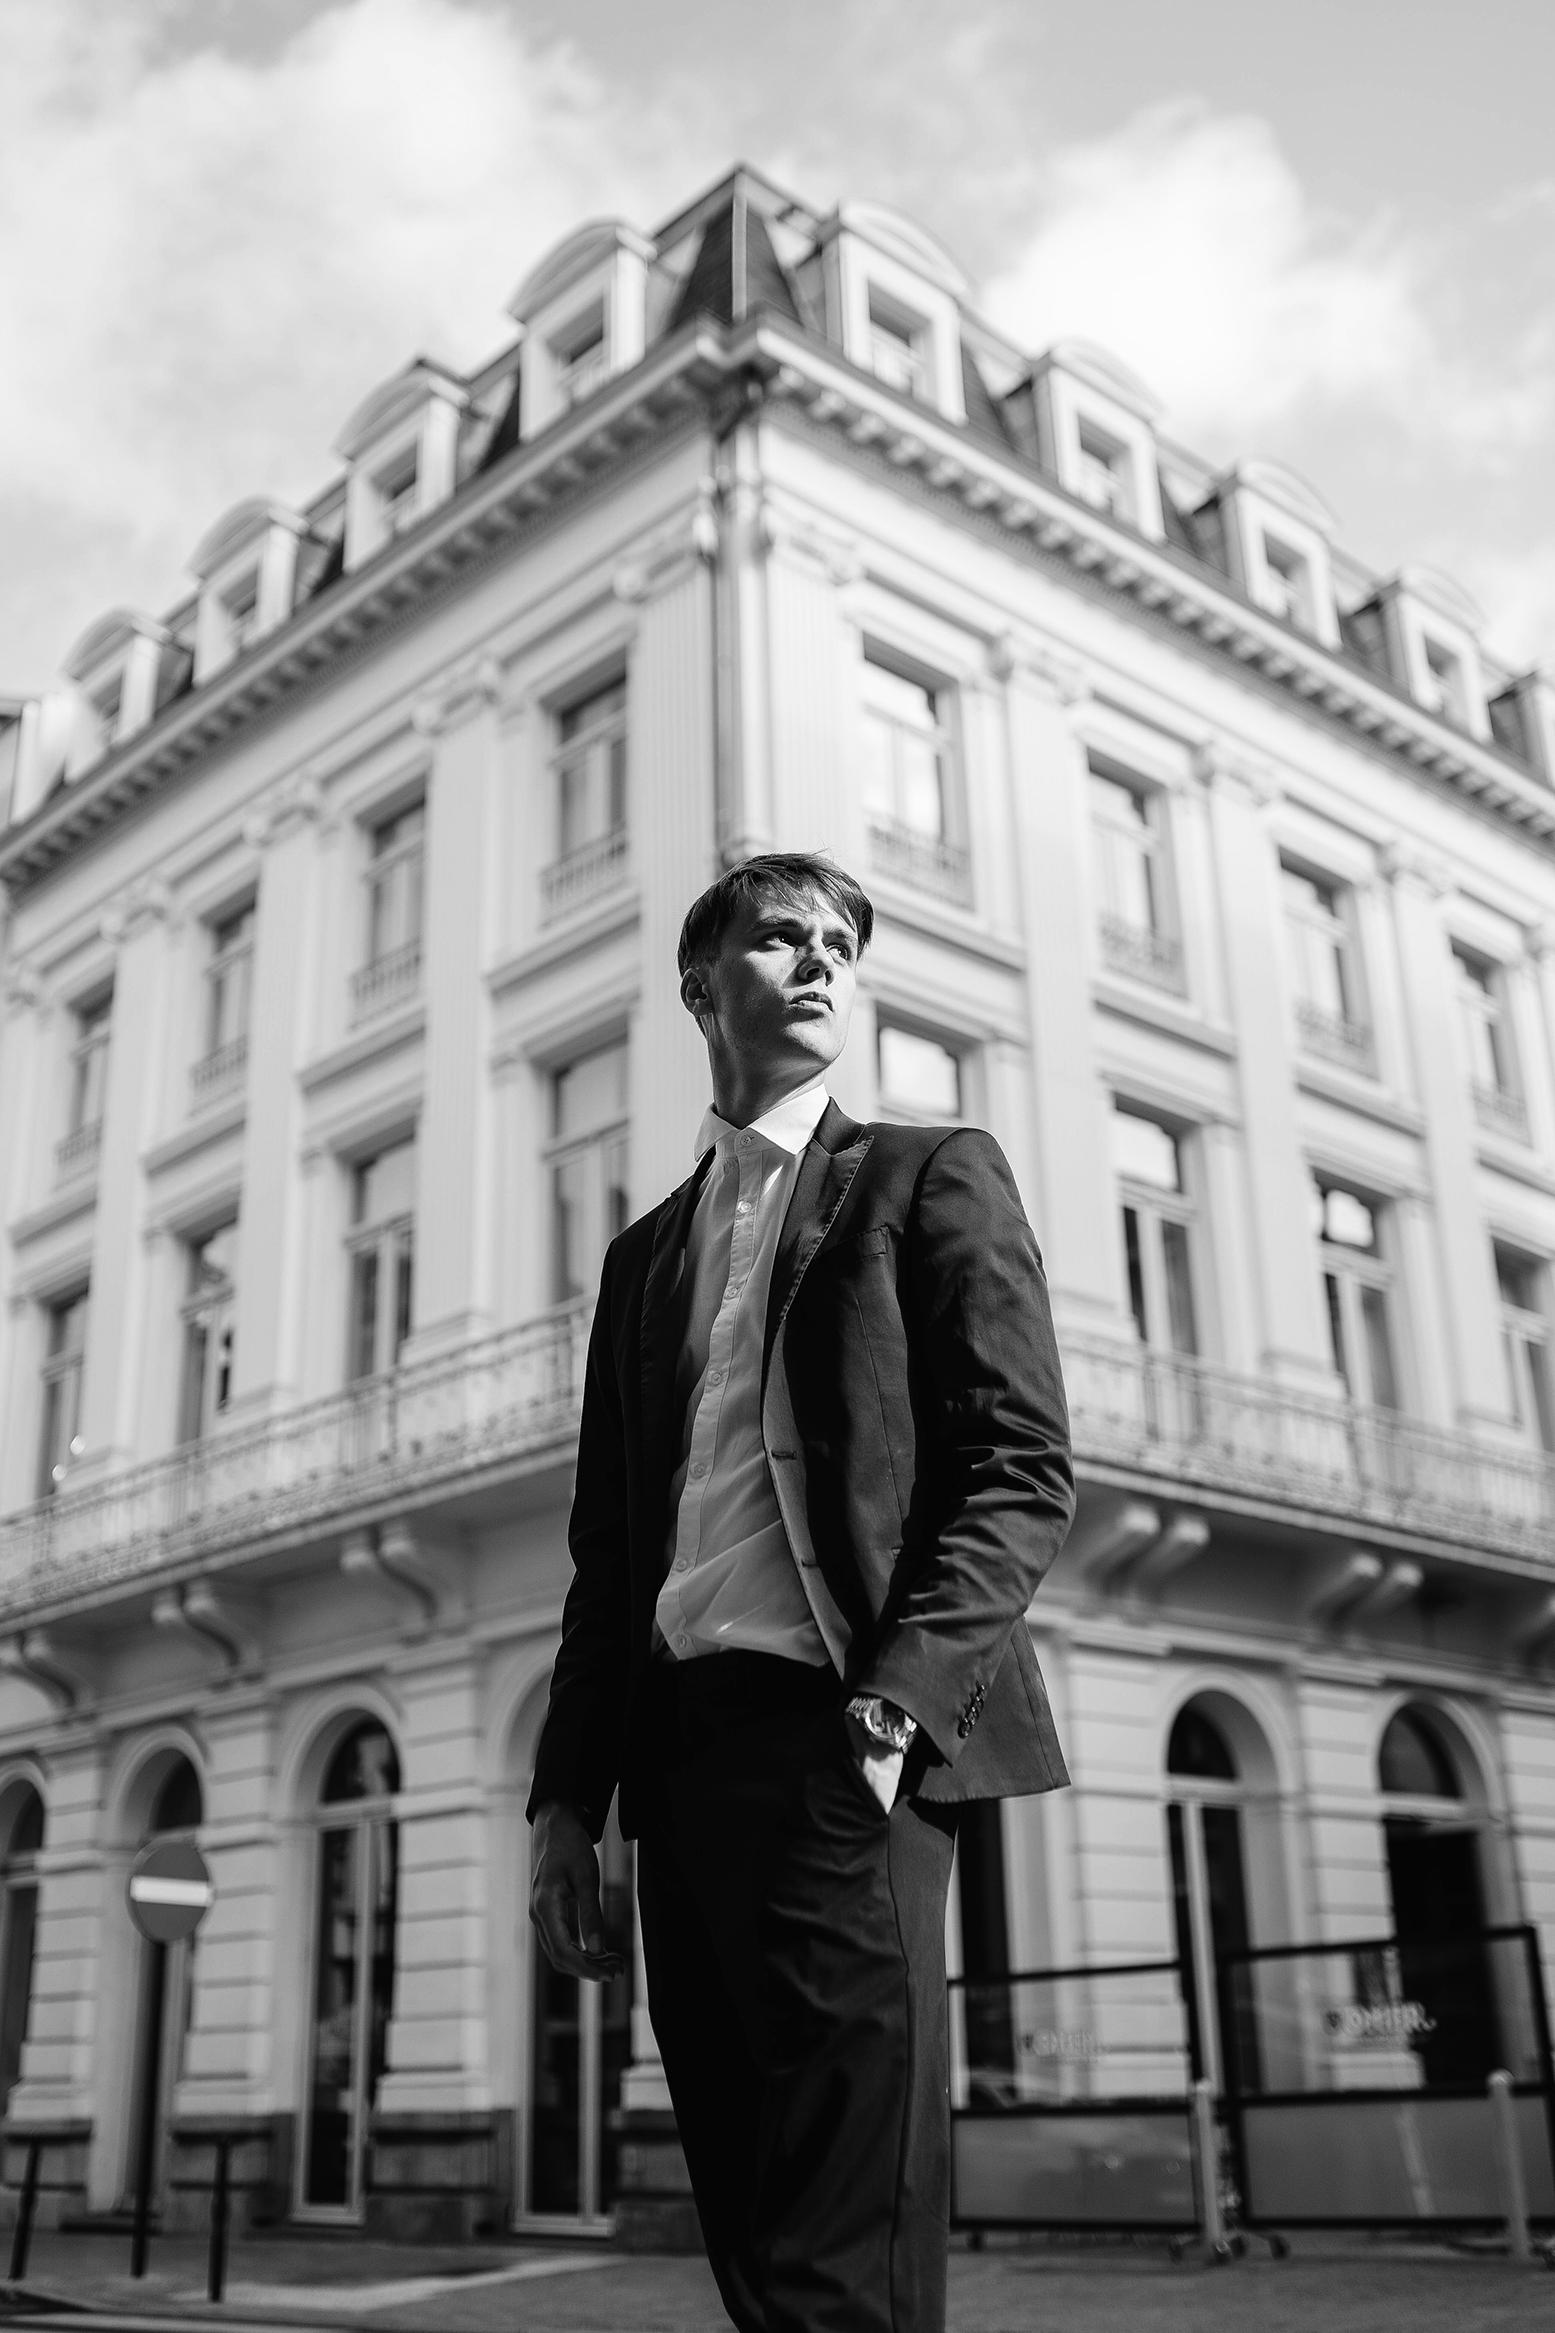 photographe-Bruxelles-homme-shooting-nicolasleleu-11.jpg